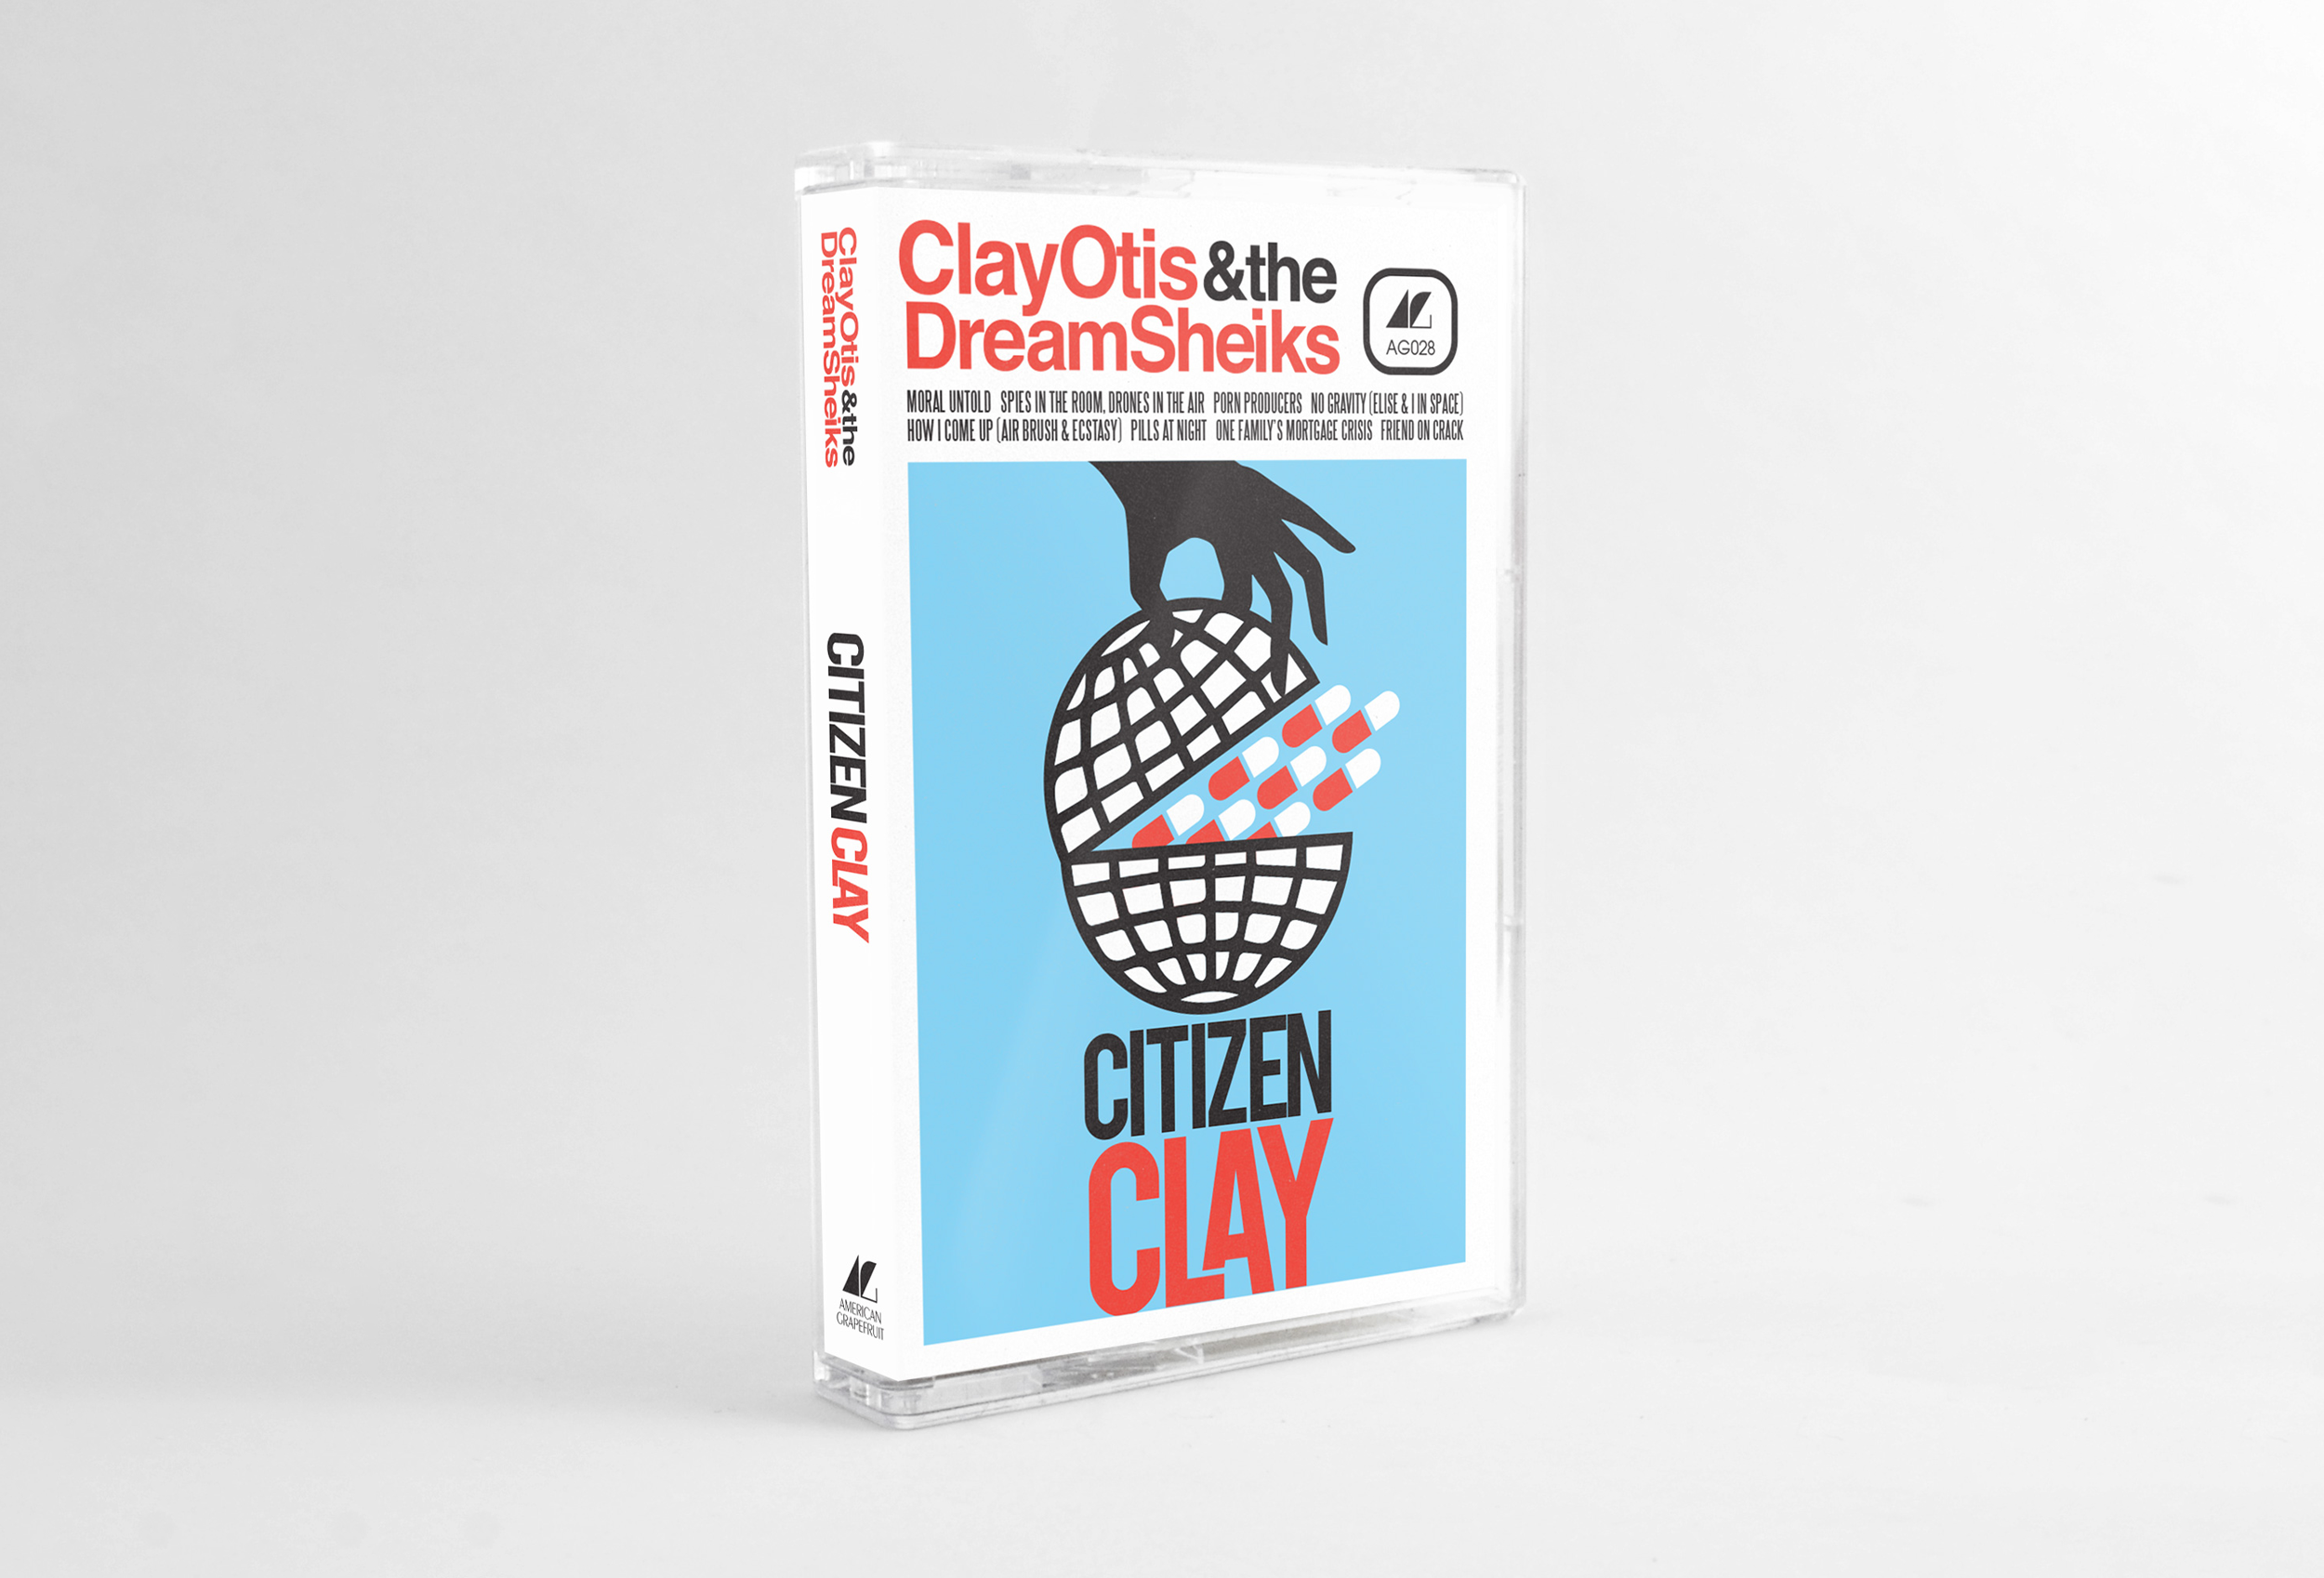 Citizen-Clay-Cassette-Cover-Mockup2.jpg